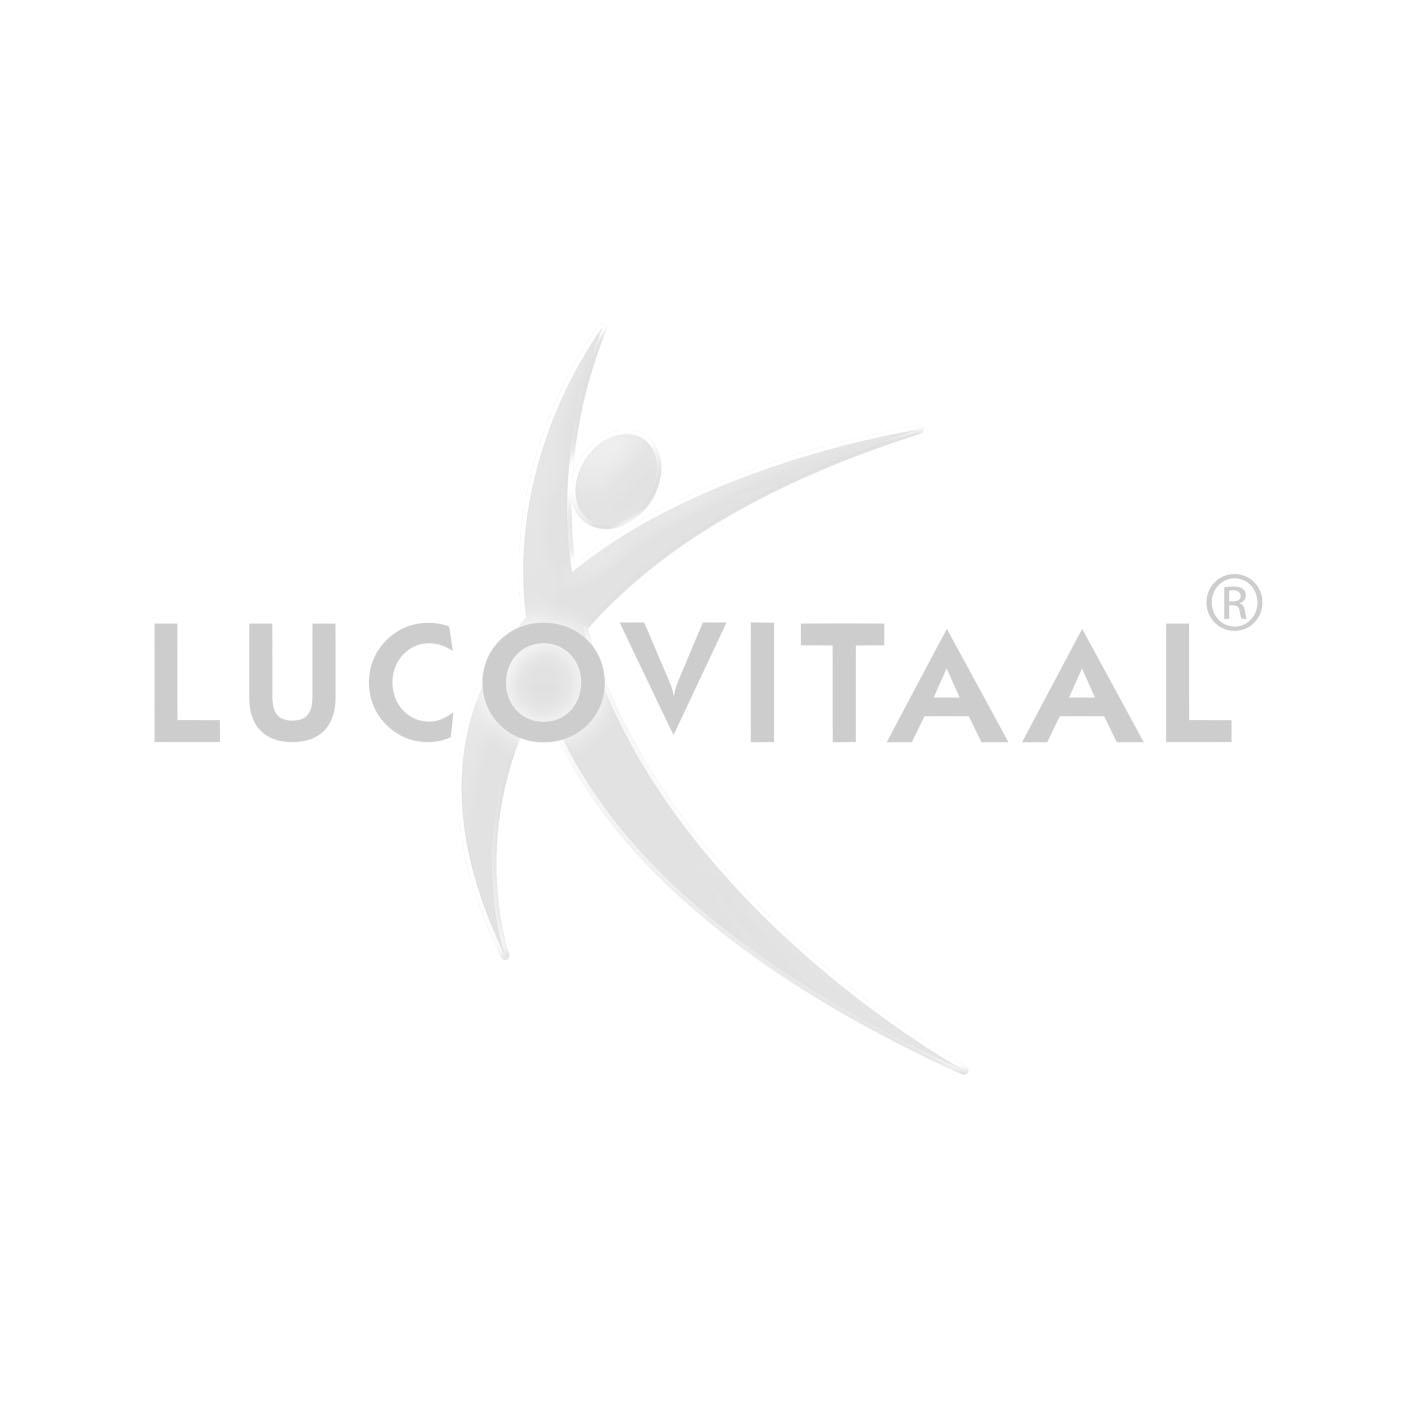 Visolie & knoflook 2x90 capsules Duo Voordeel